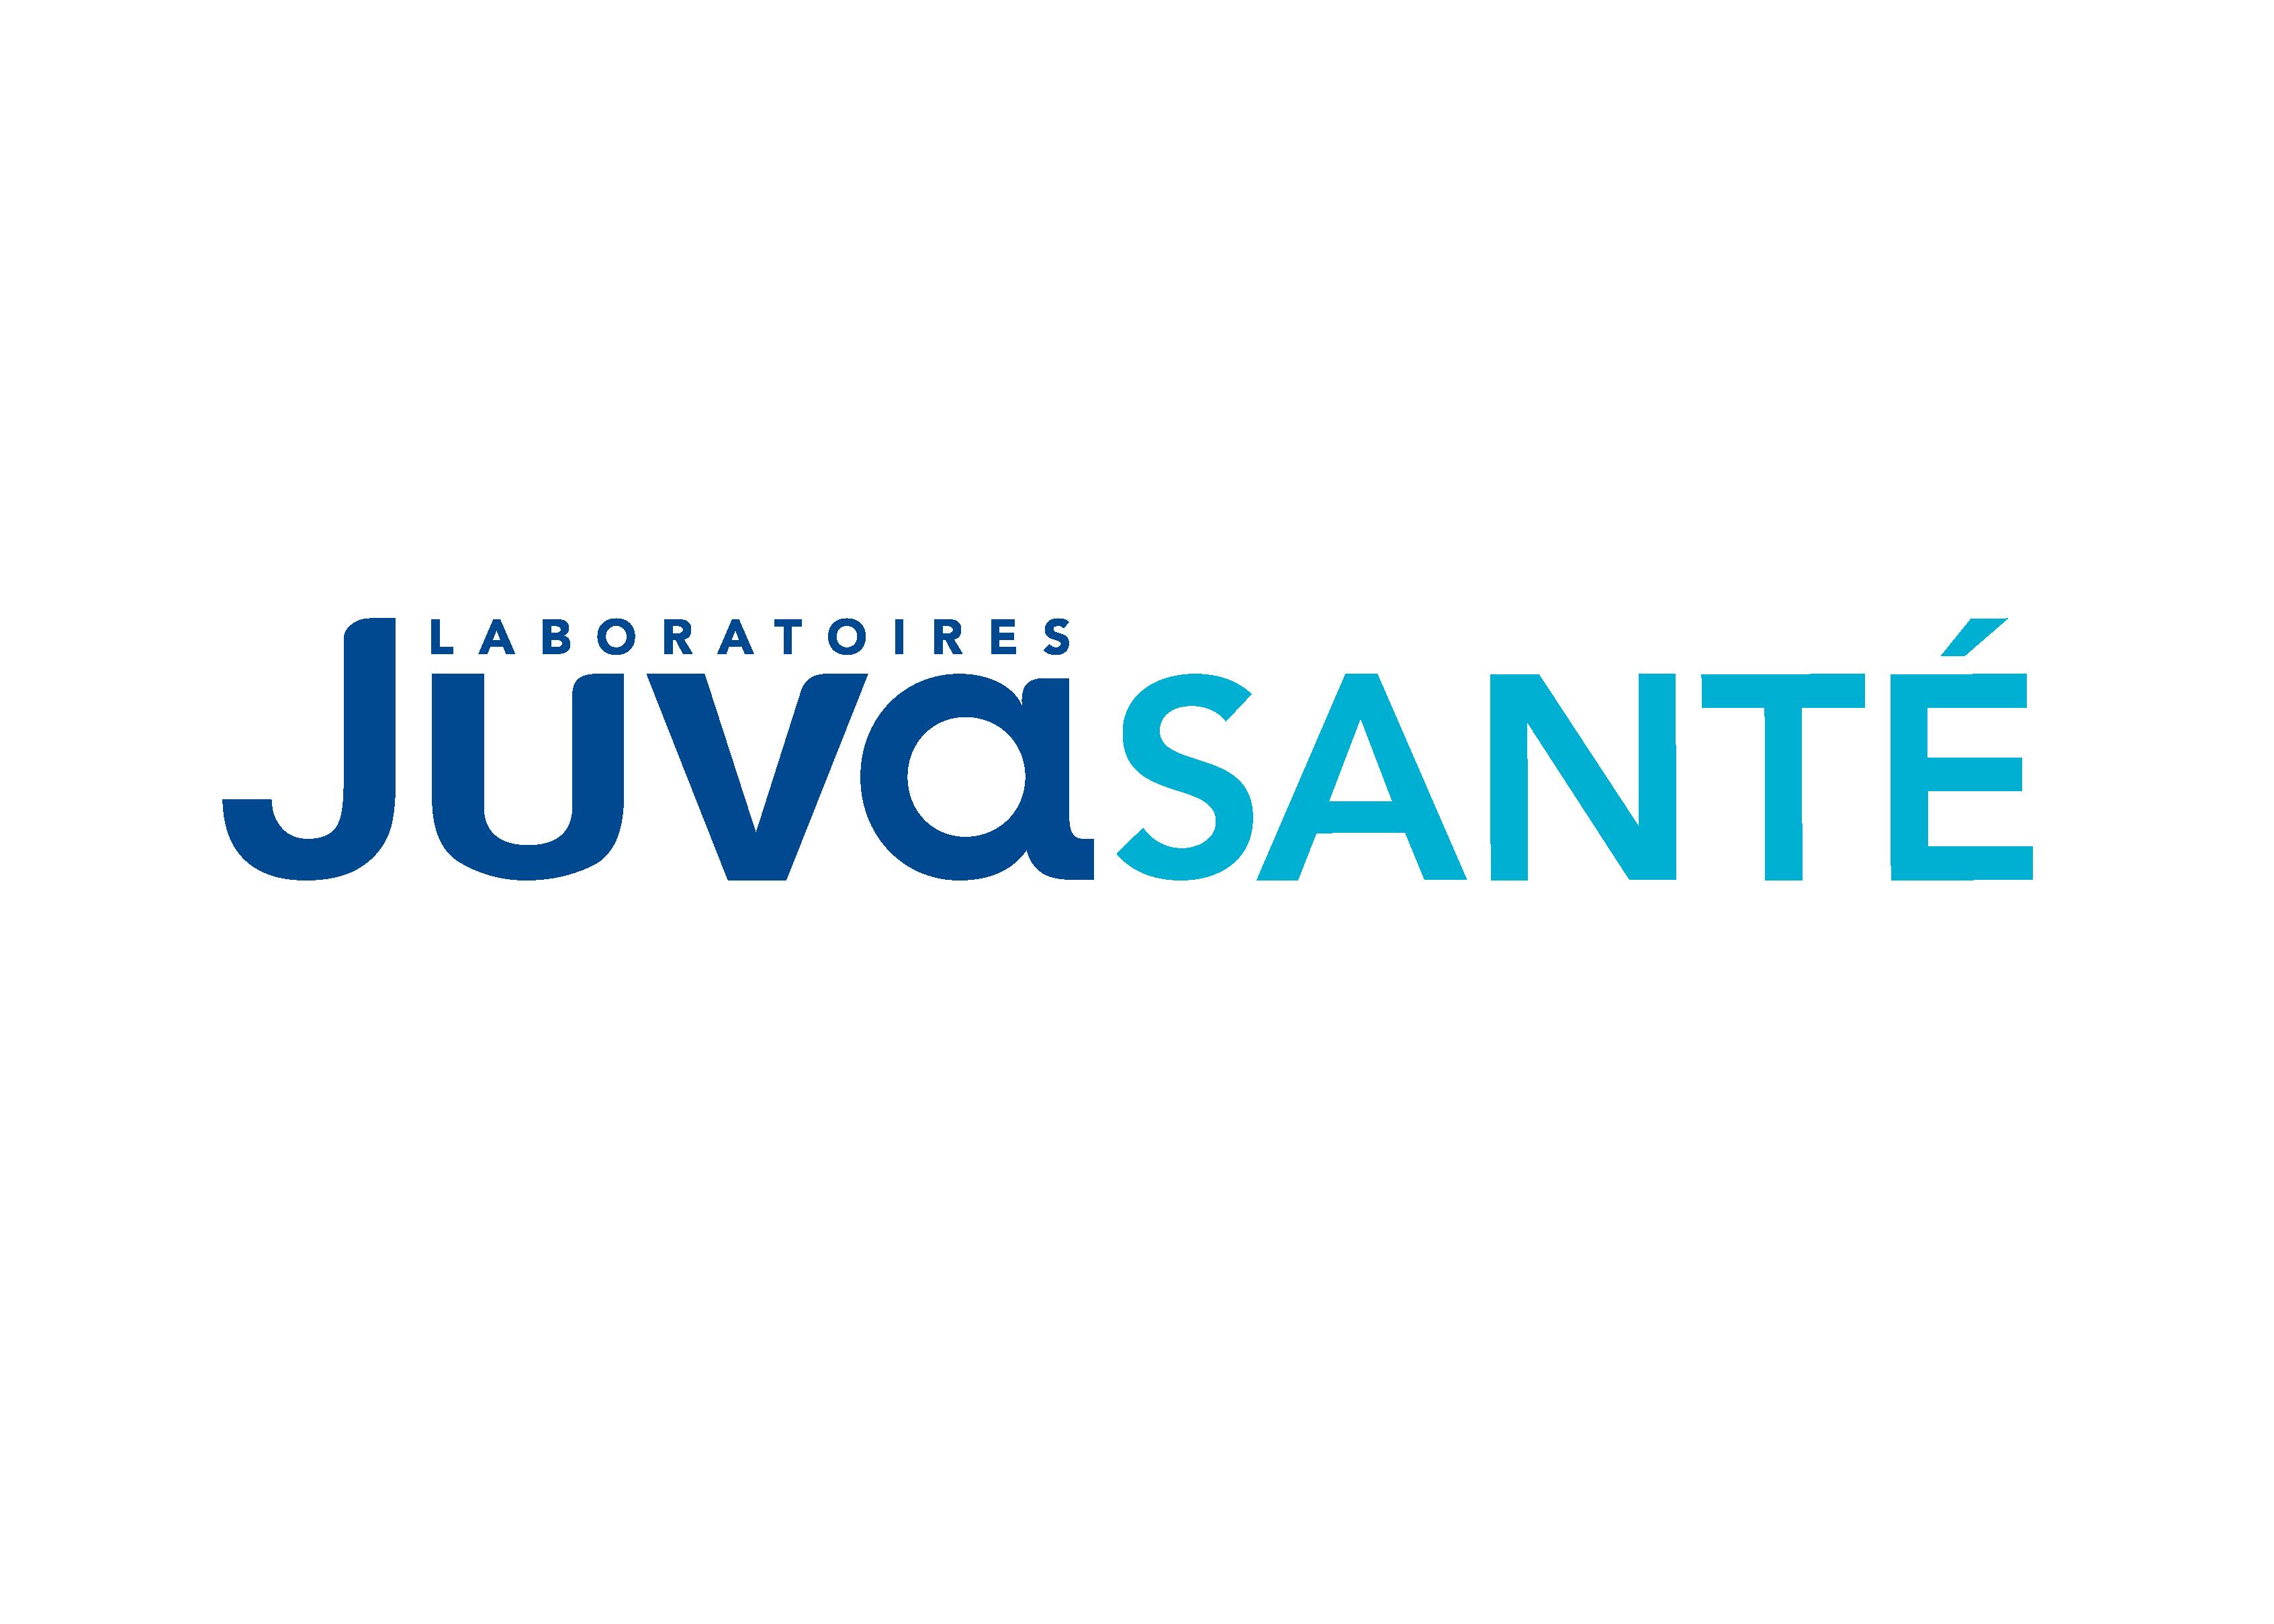 https://europeanplasticspact.org/wp-content/uploads/2021/05/juvasante_logo.png